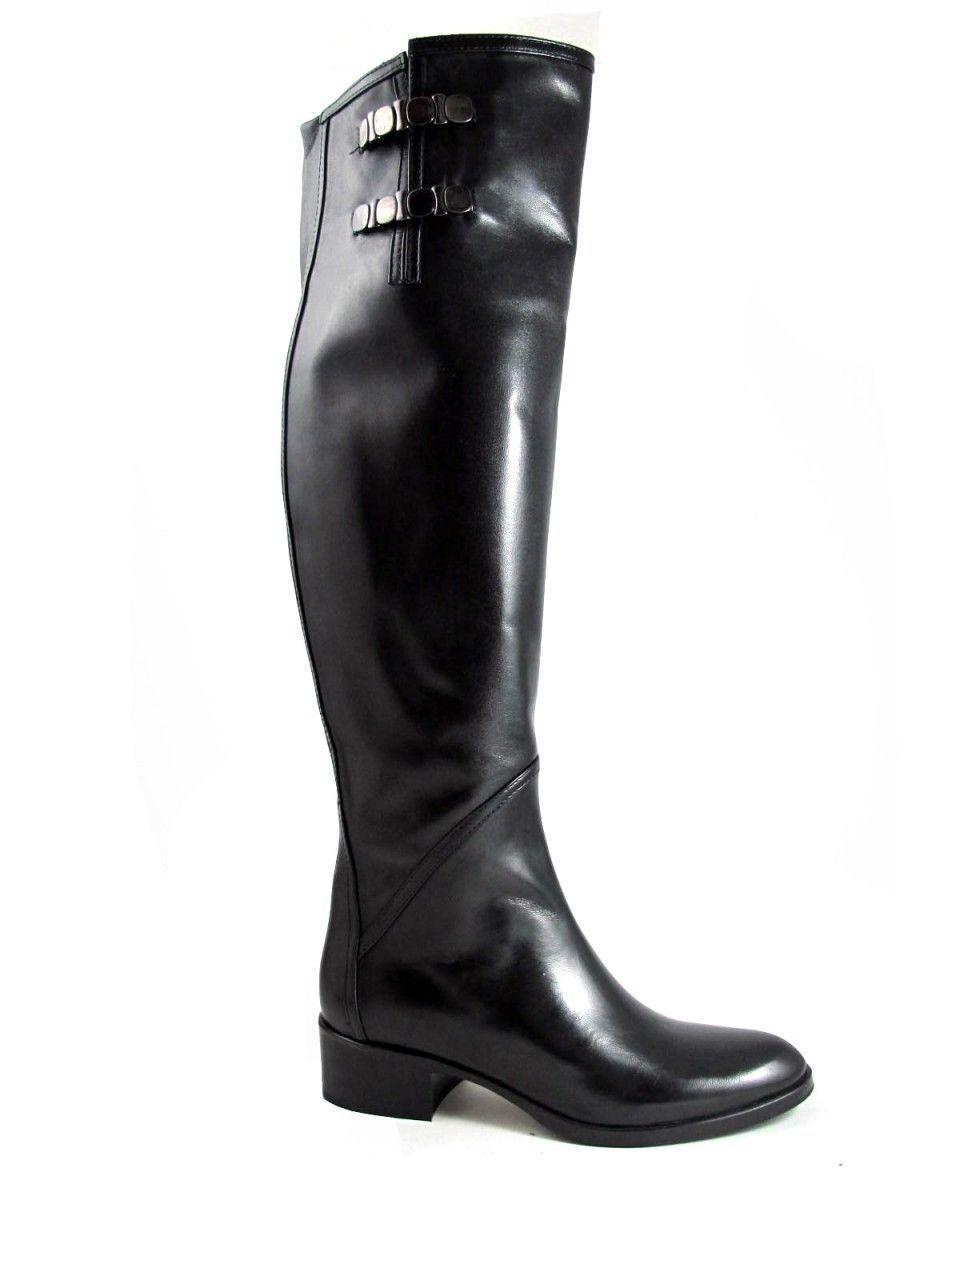 Le Pepe 449467 Women's Knee High Boot